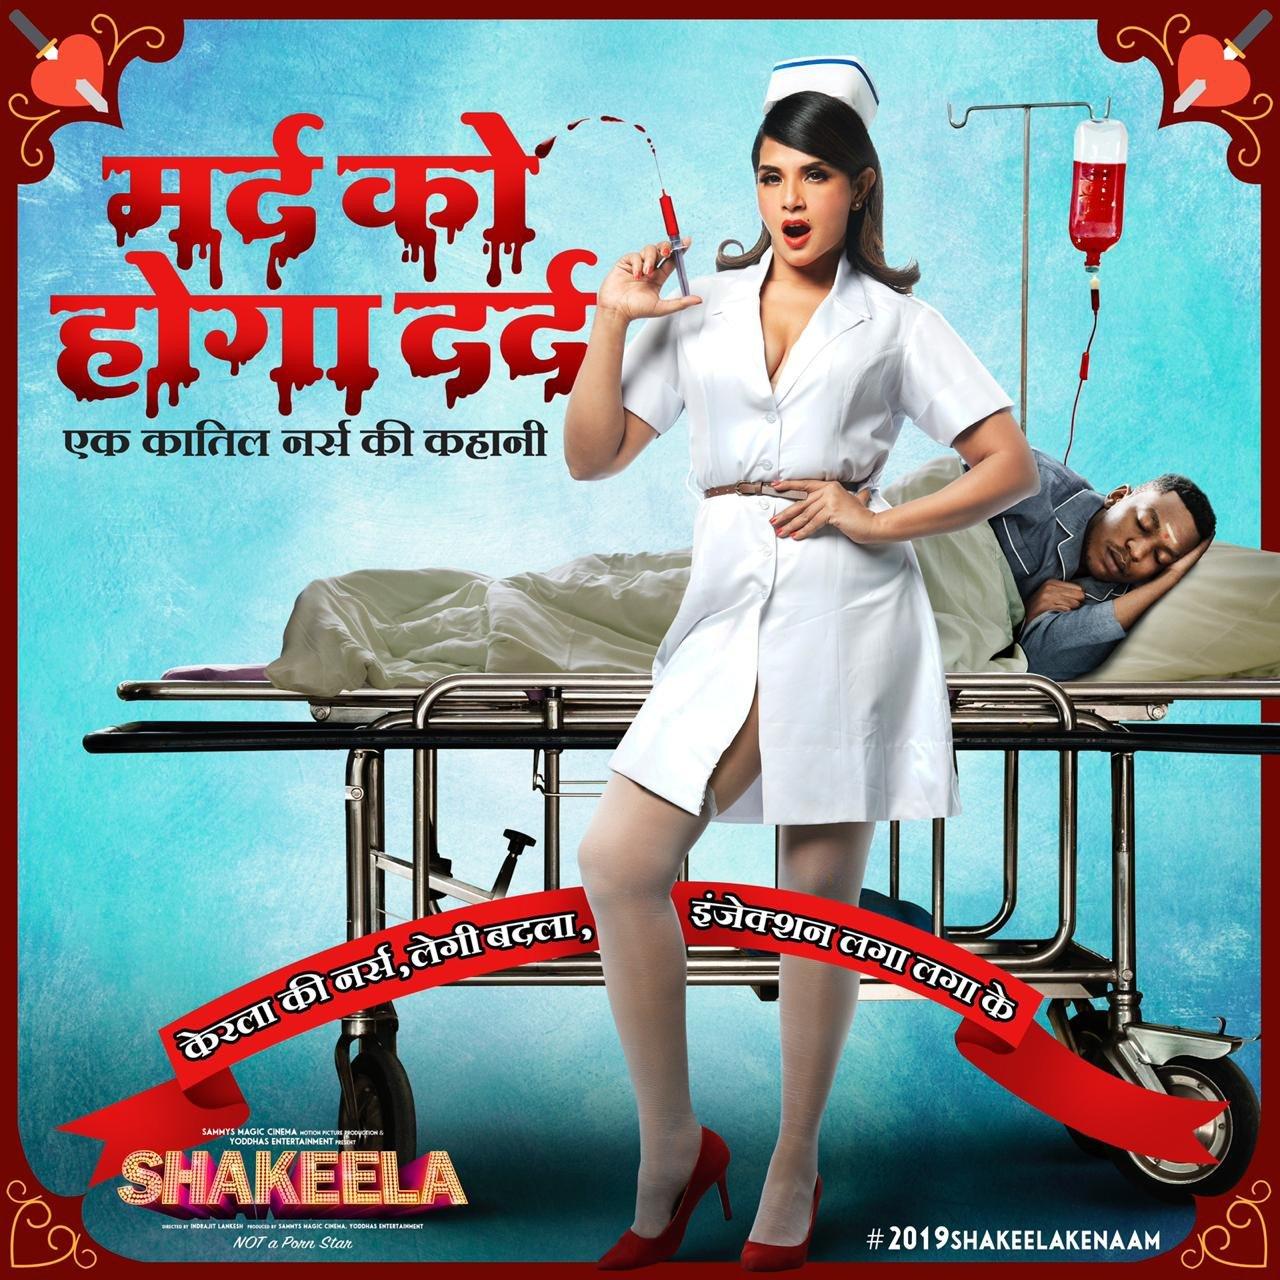 I hope people find humour in the 'Shakeela' calendar : Richa Chadha